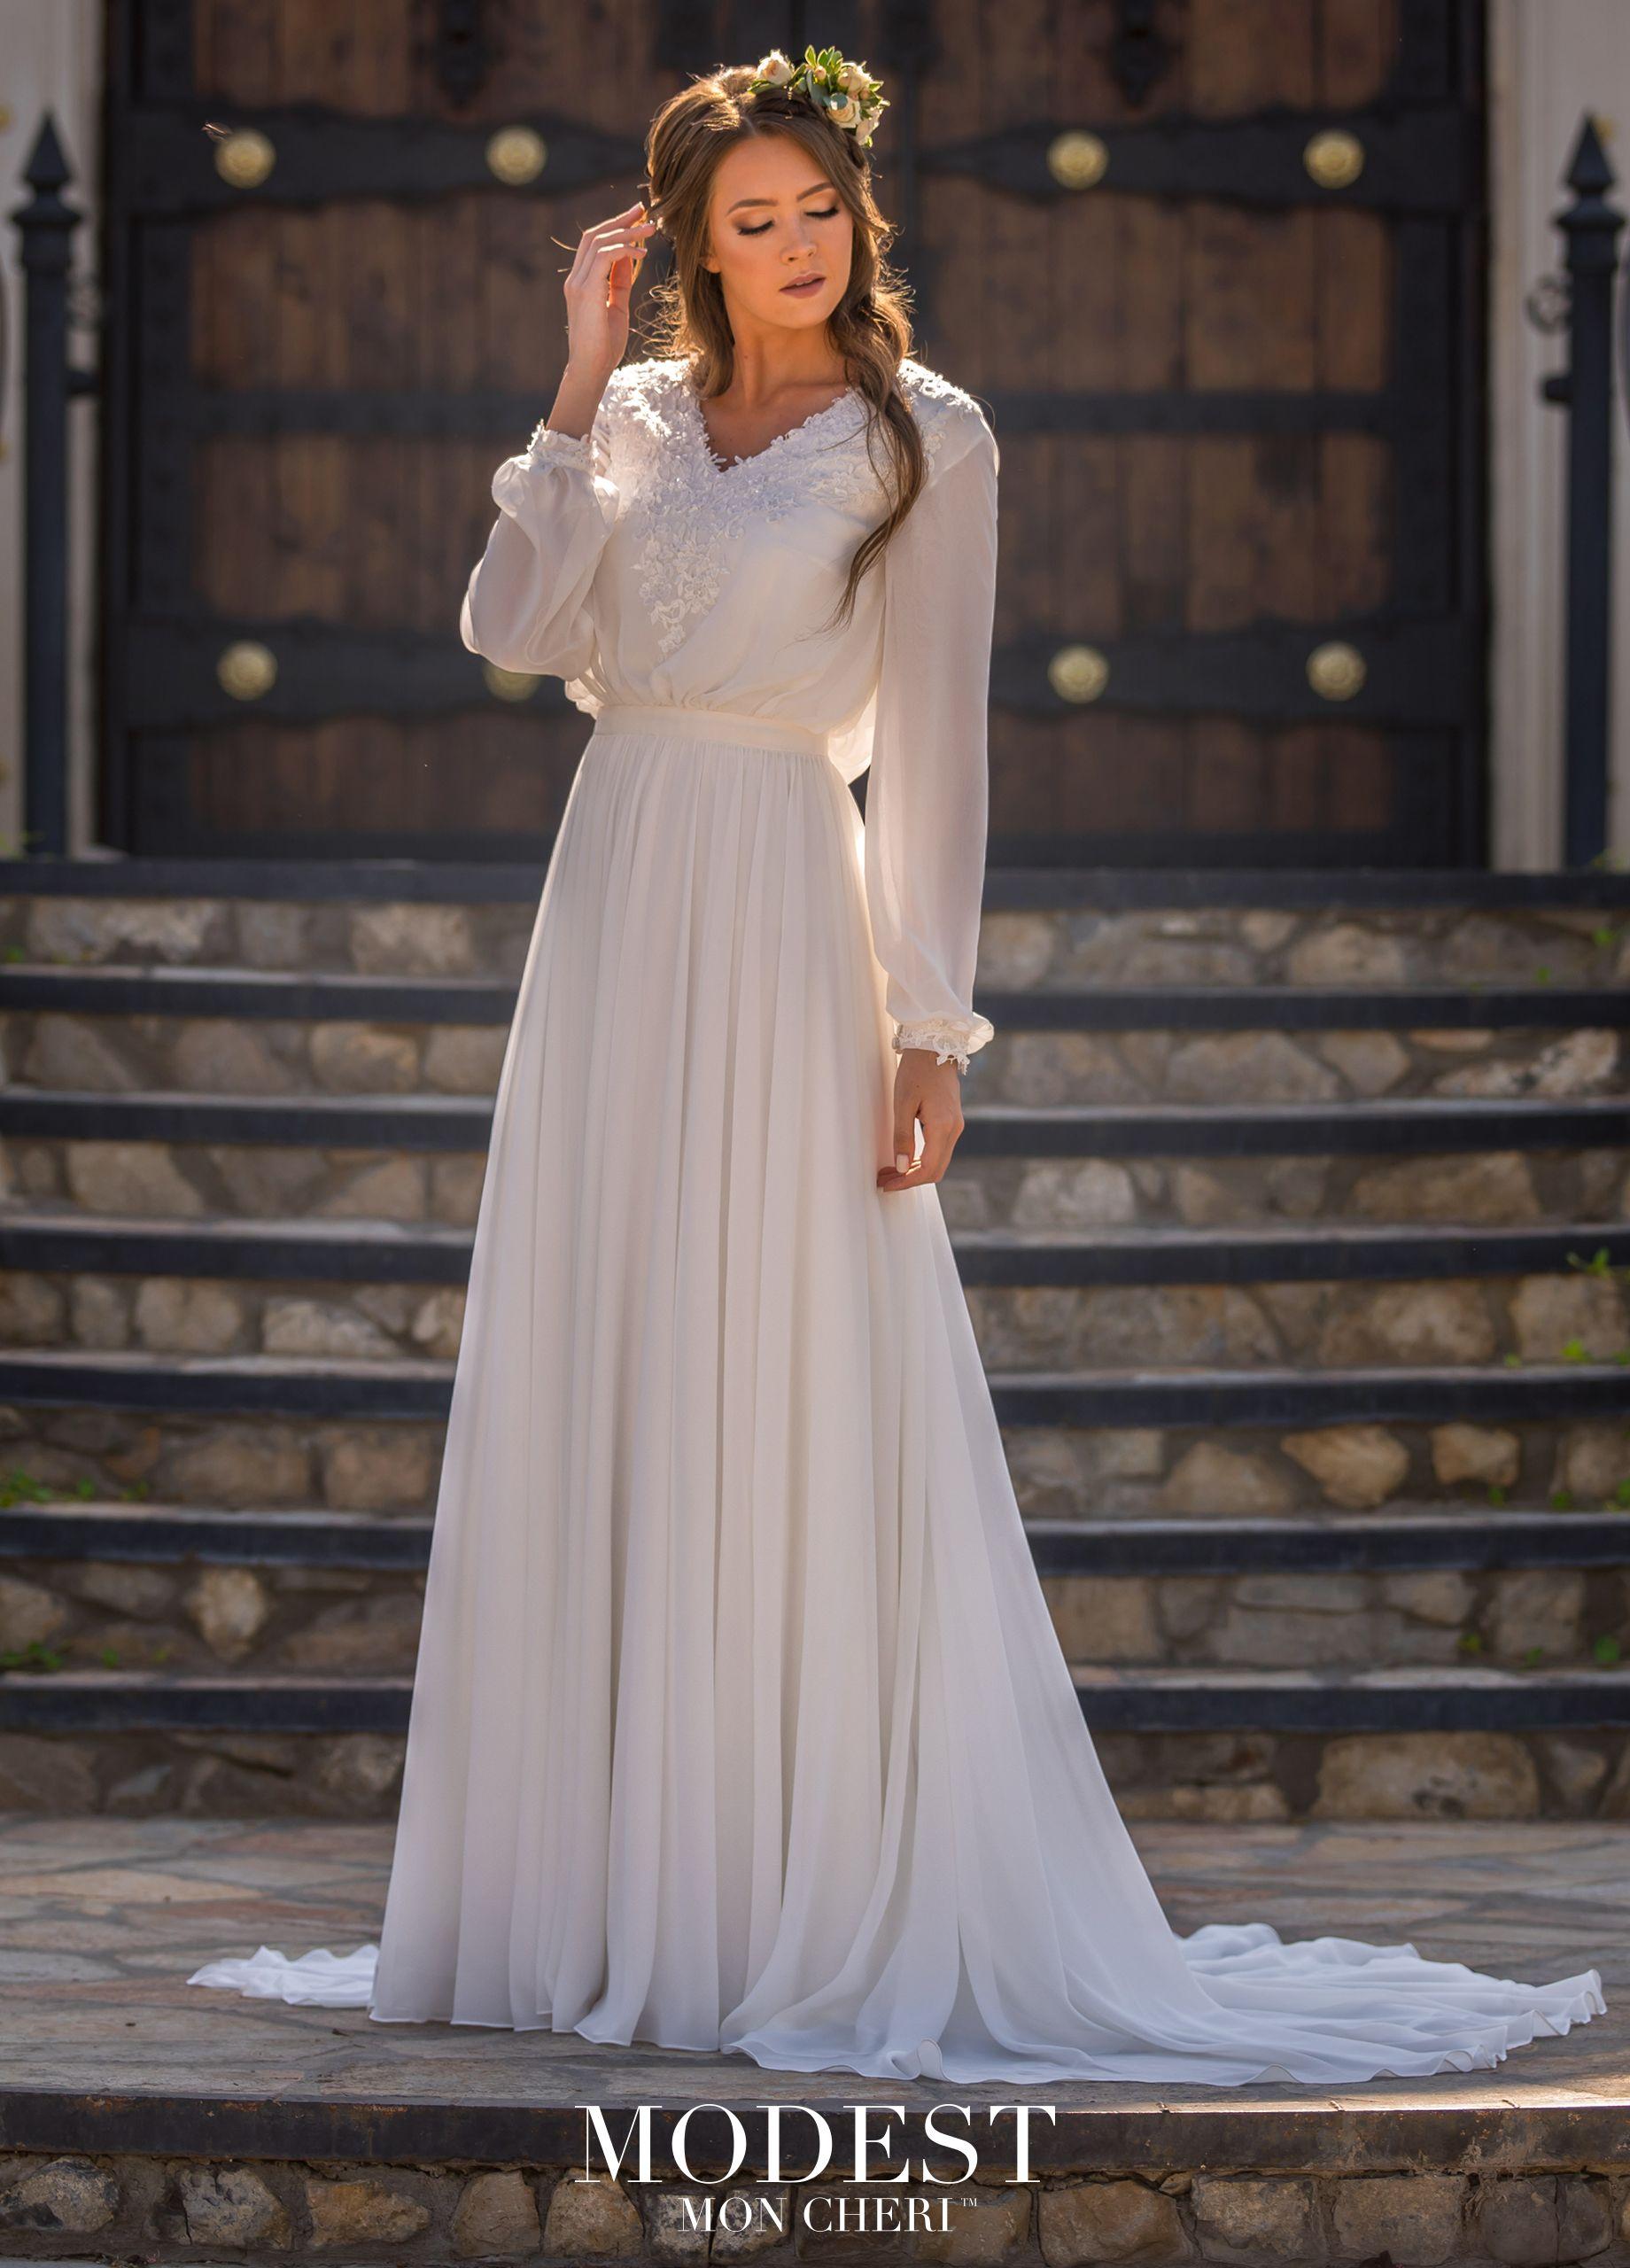 Modest By Mon Cheri Tr11977 Modest Wedding Dresses Modest Bridal Gowns Aline Wedding Dress